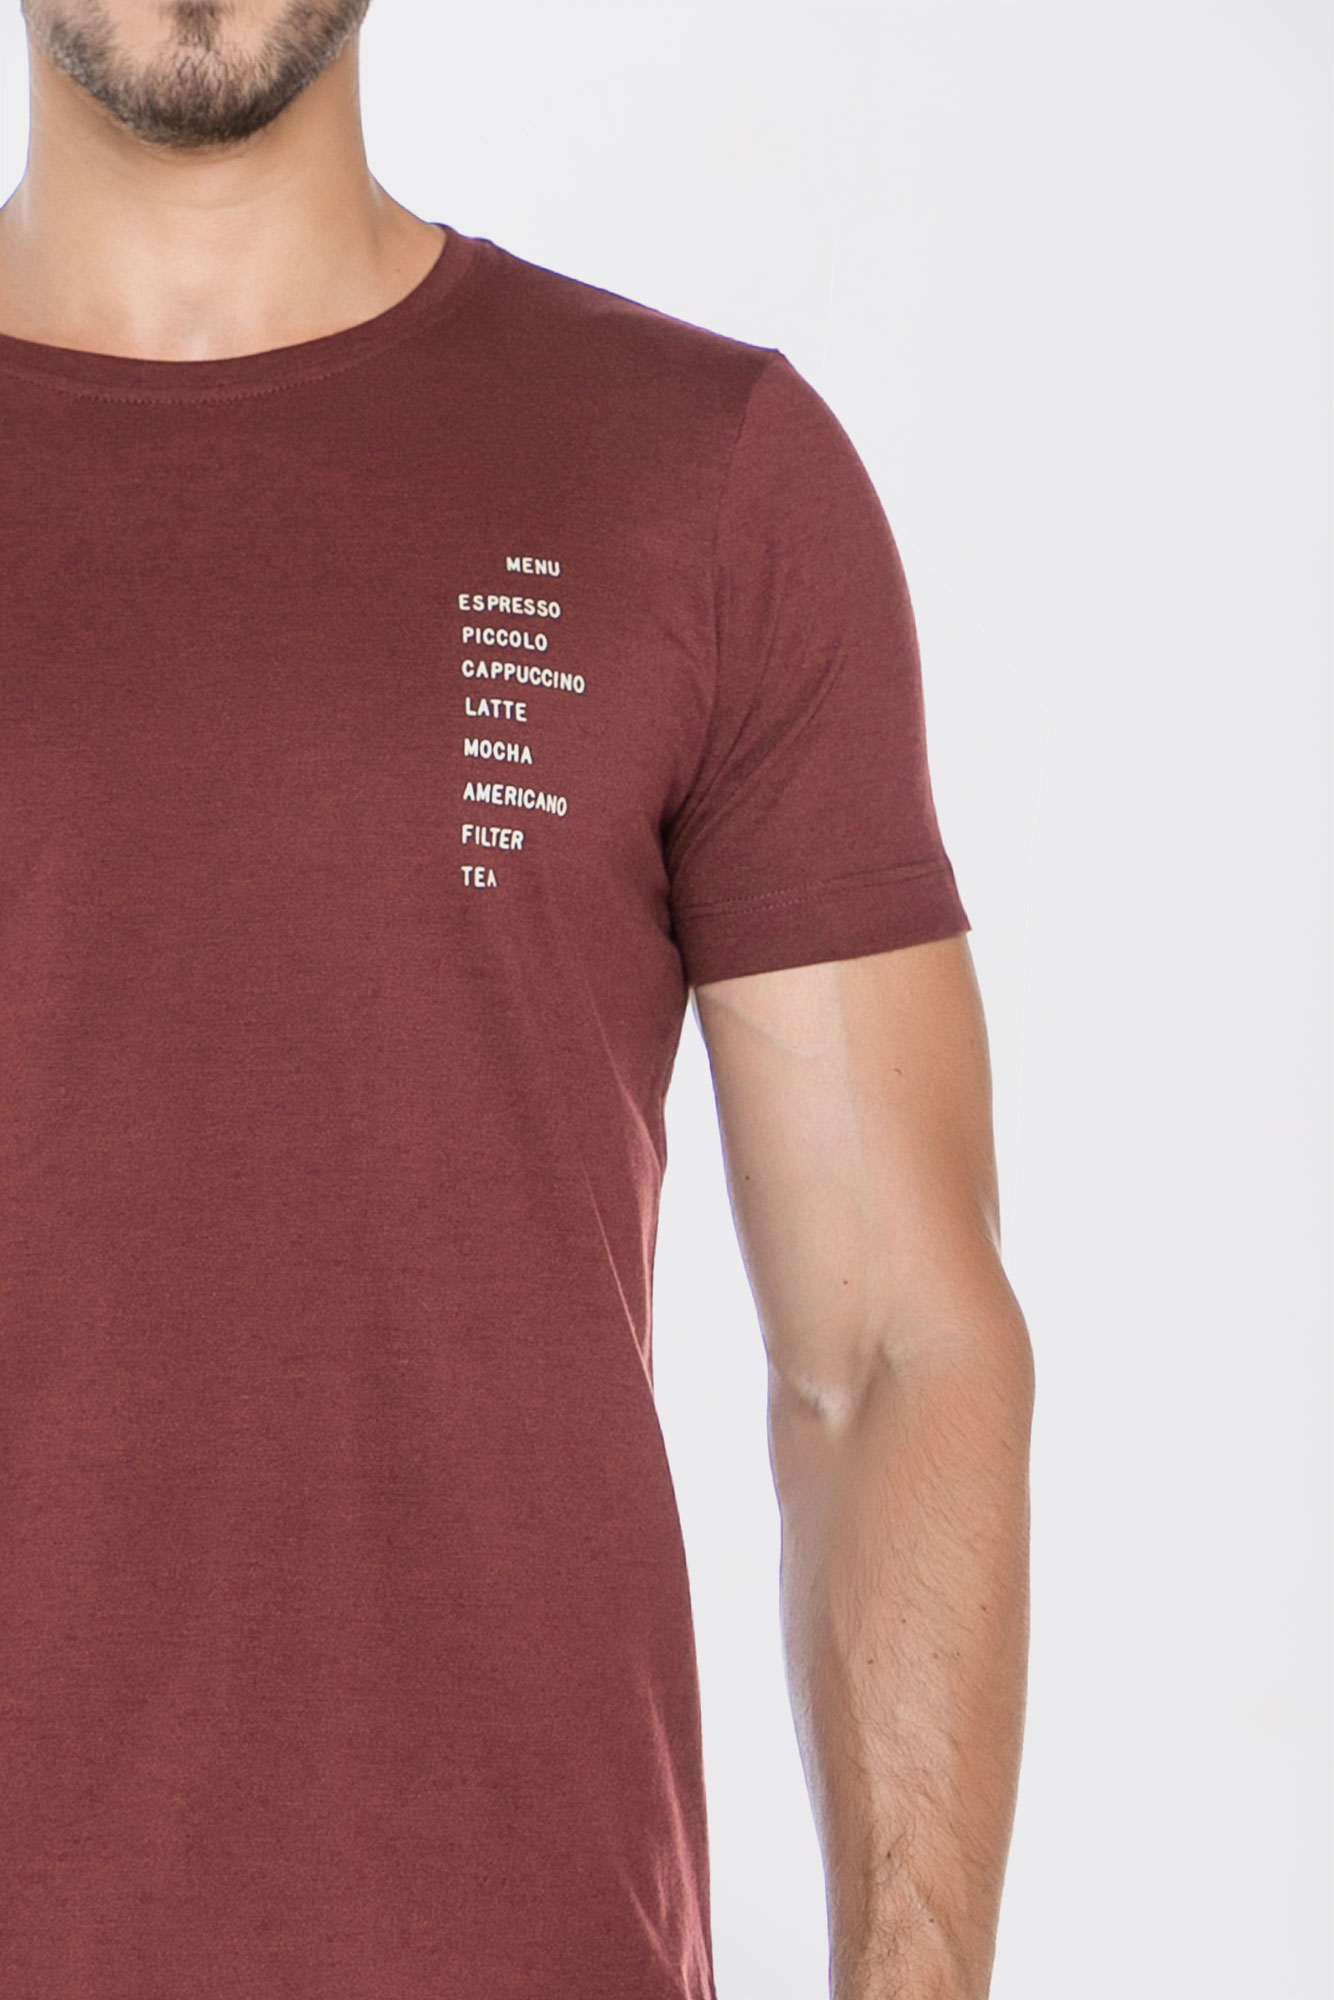 Camiseta Menu Coffee